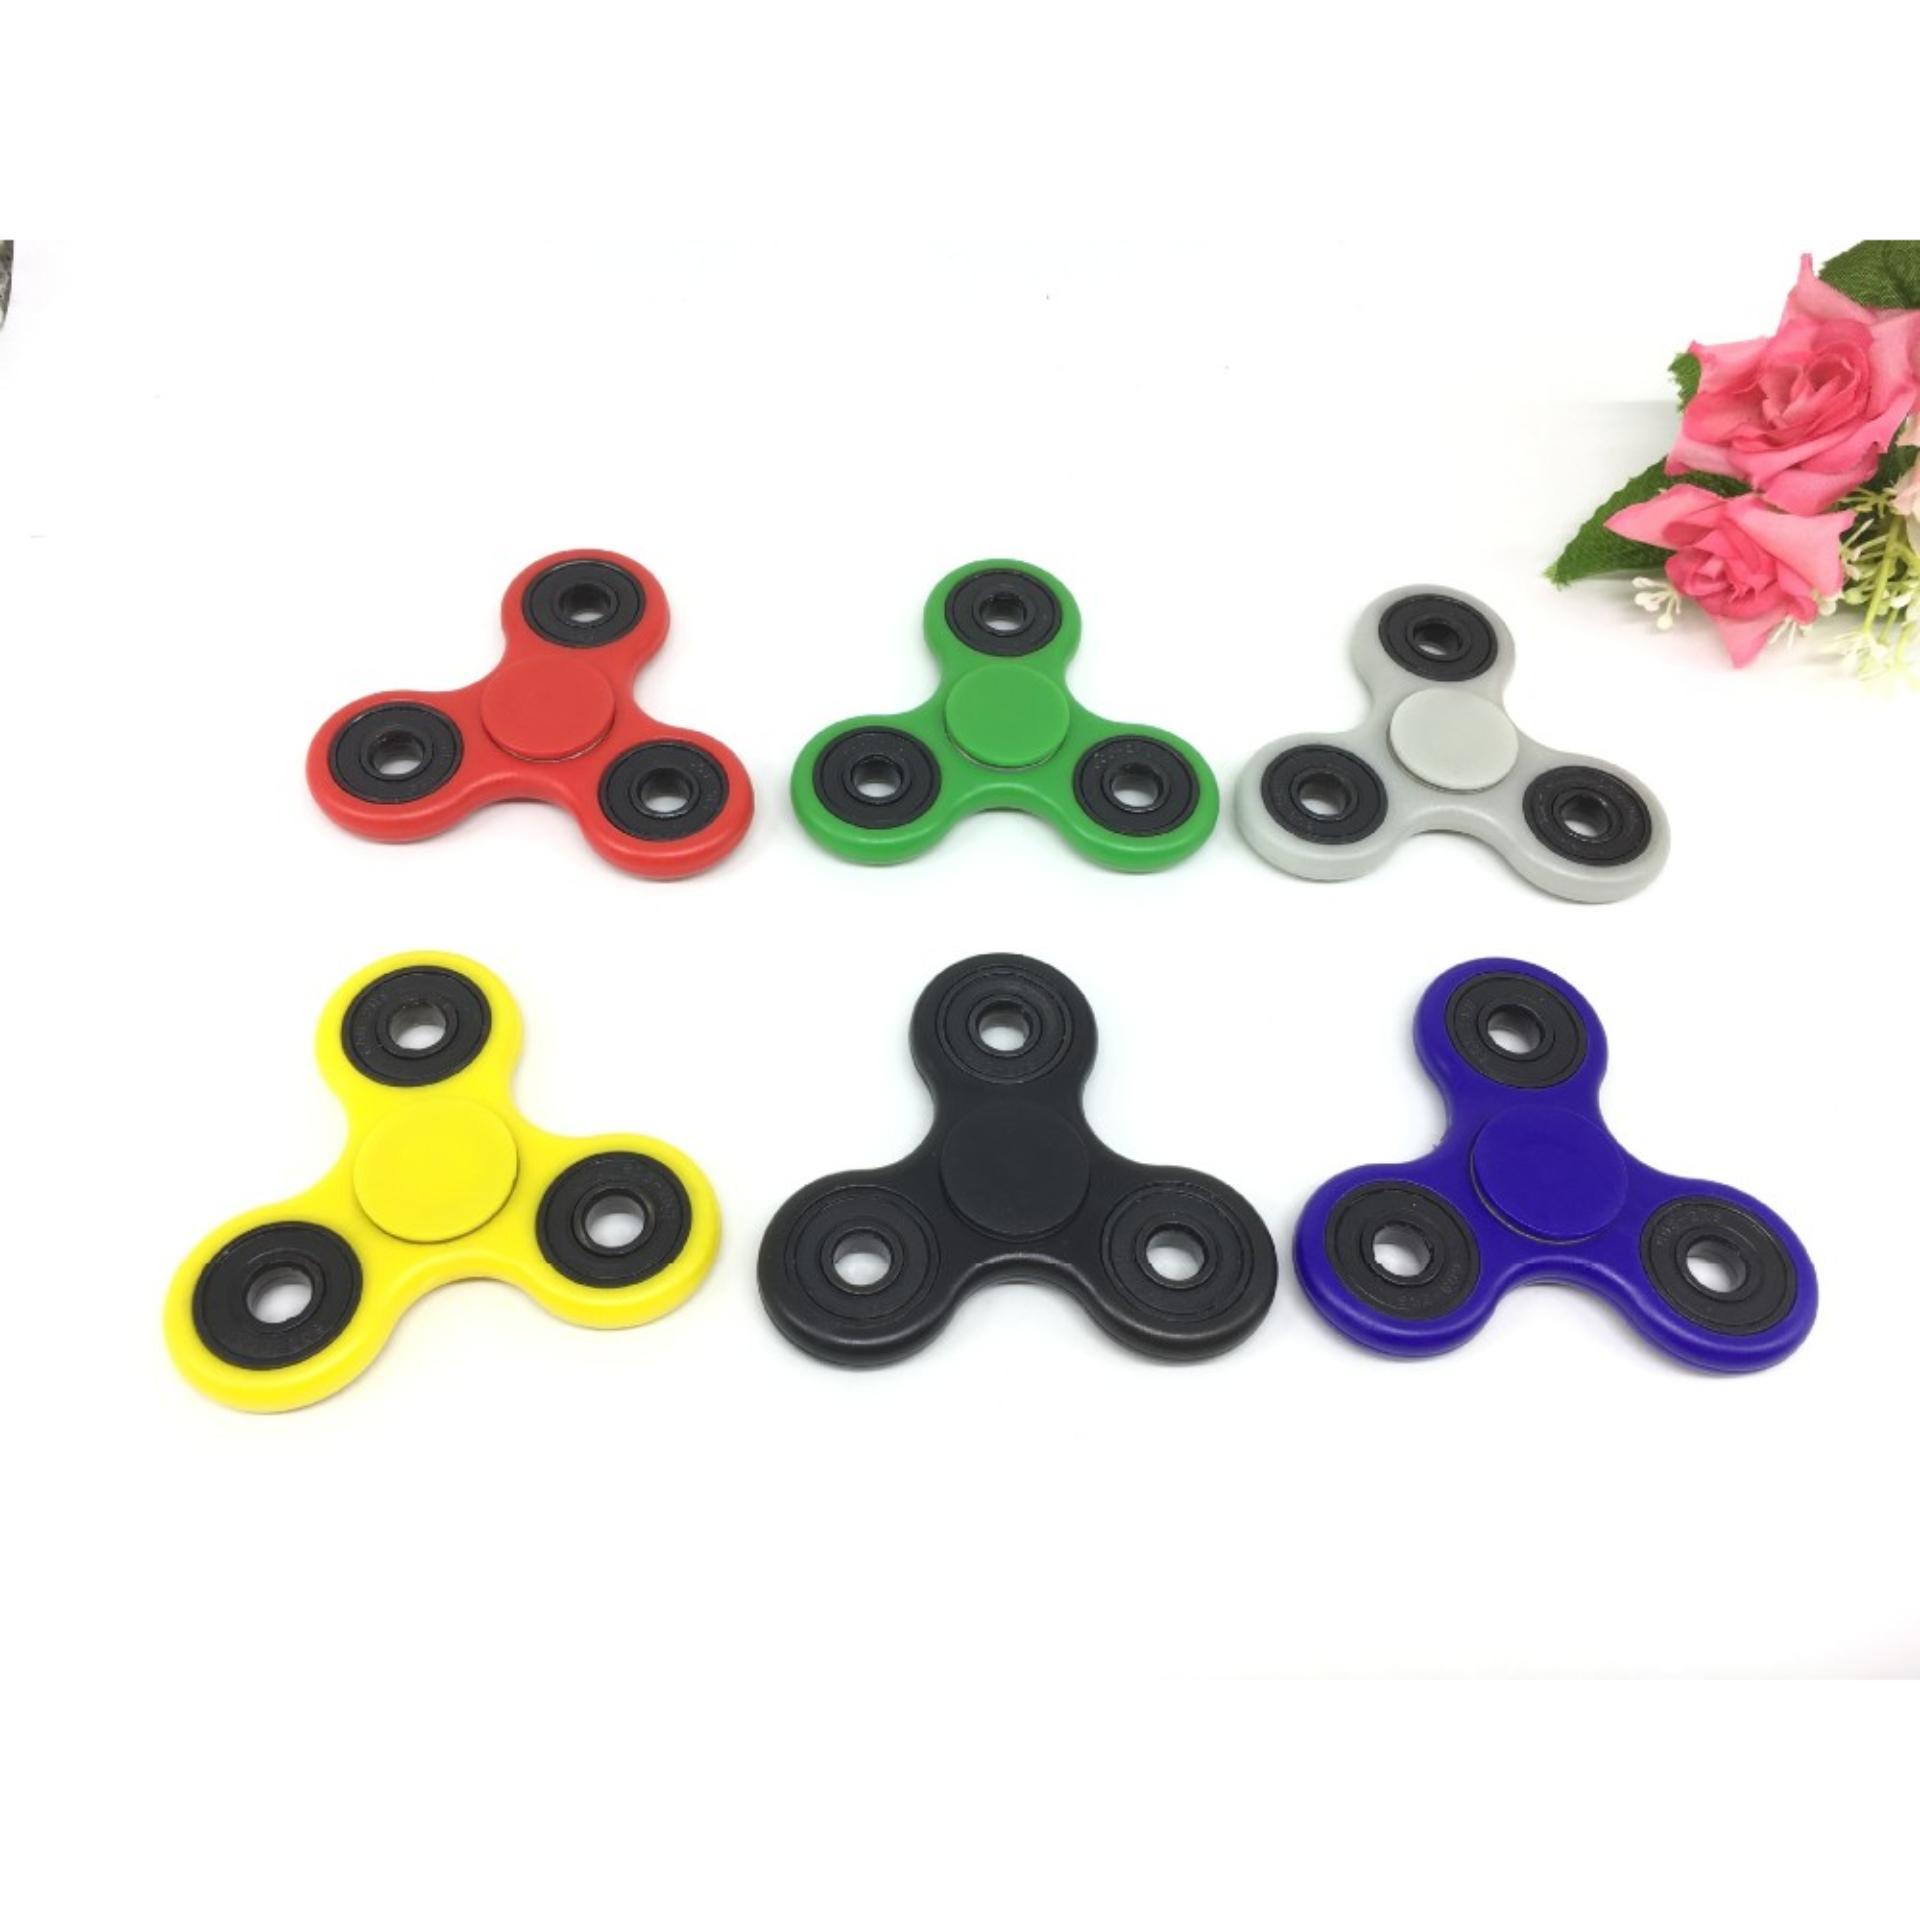 ANGEL - Papua Fidget Spinner Hand Toys Mainan Tri-Spinner EDC Focus Games - Putih